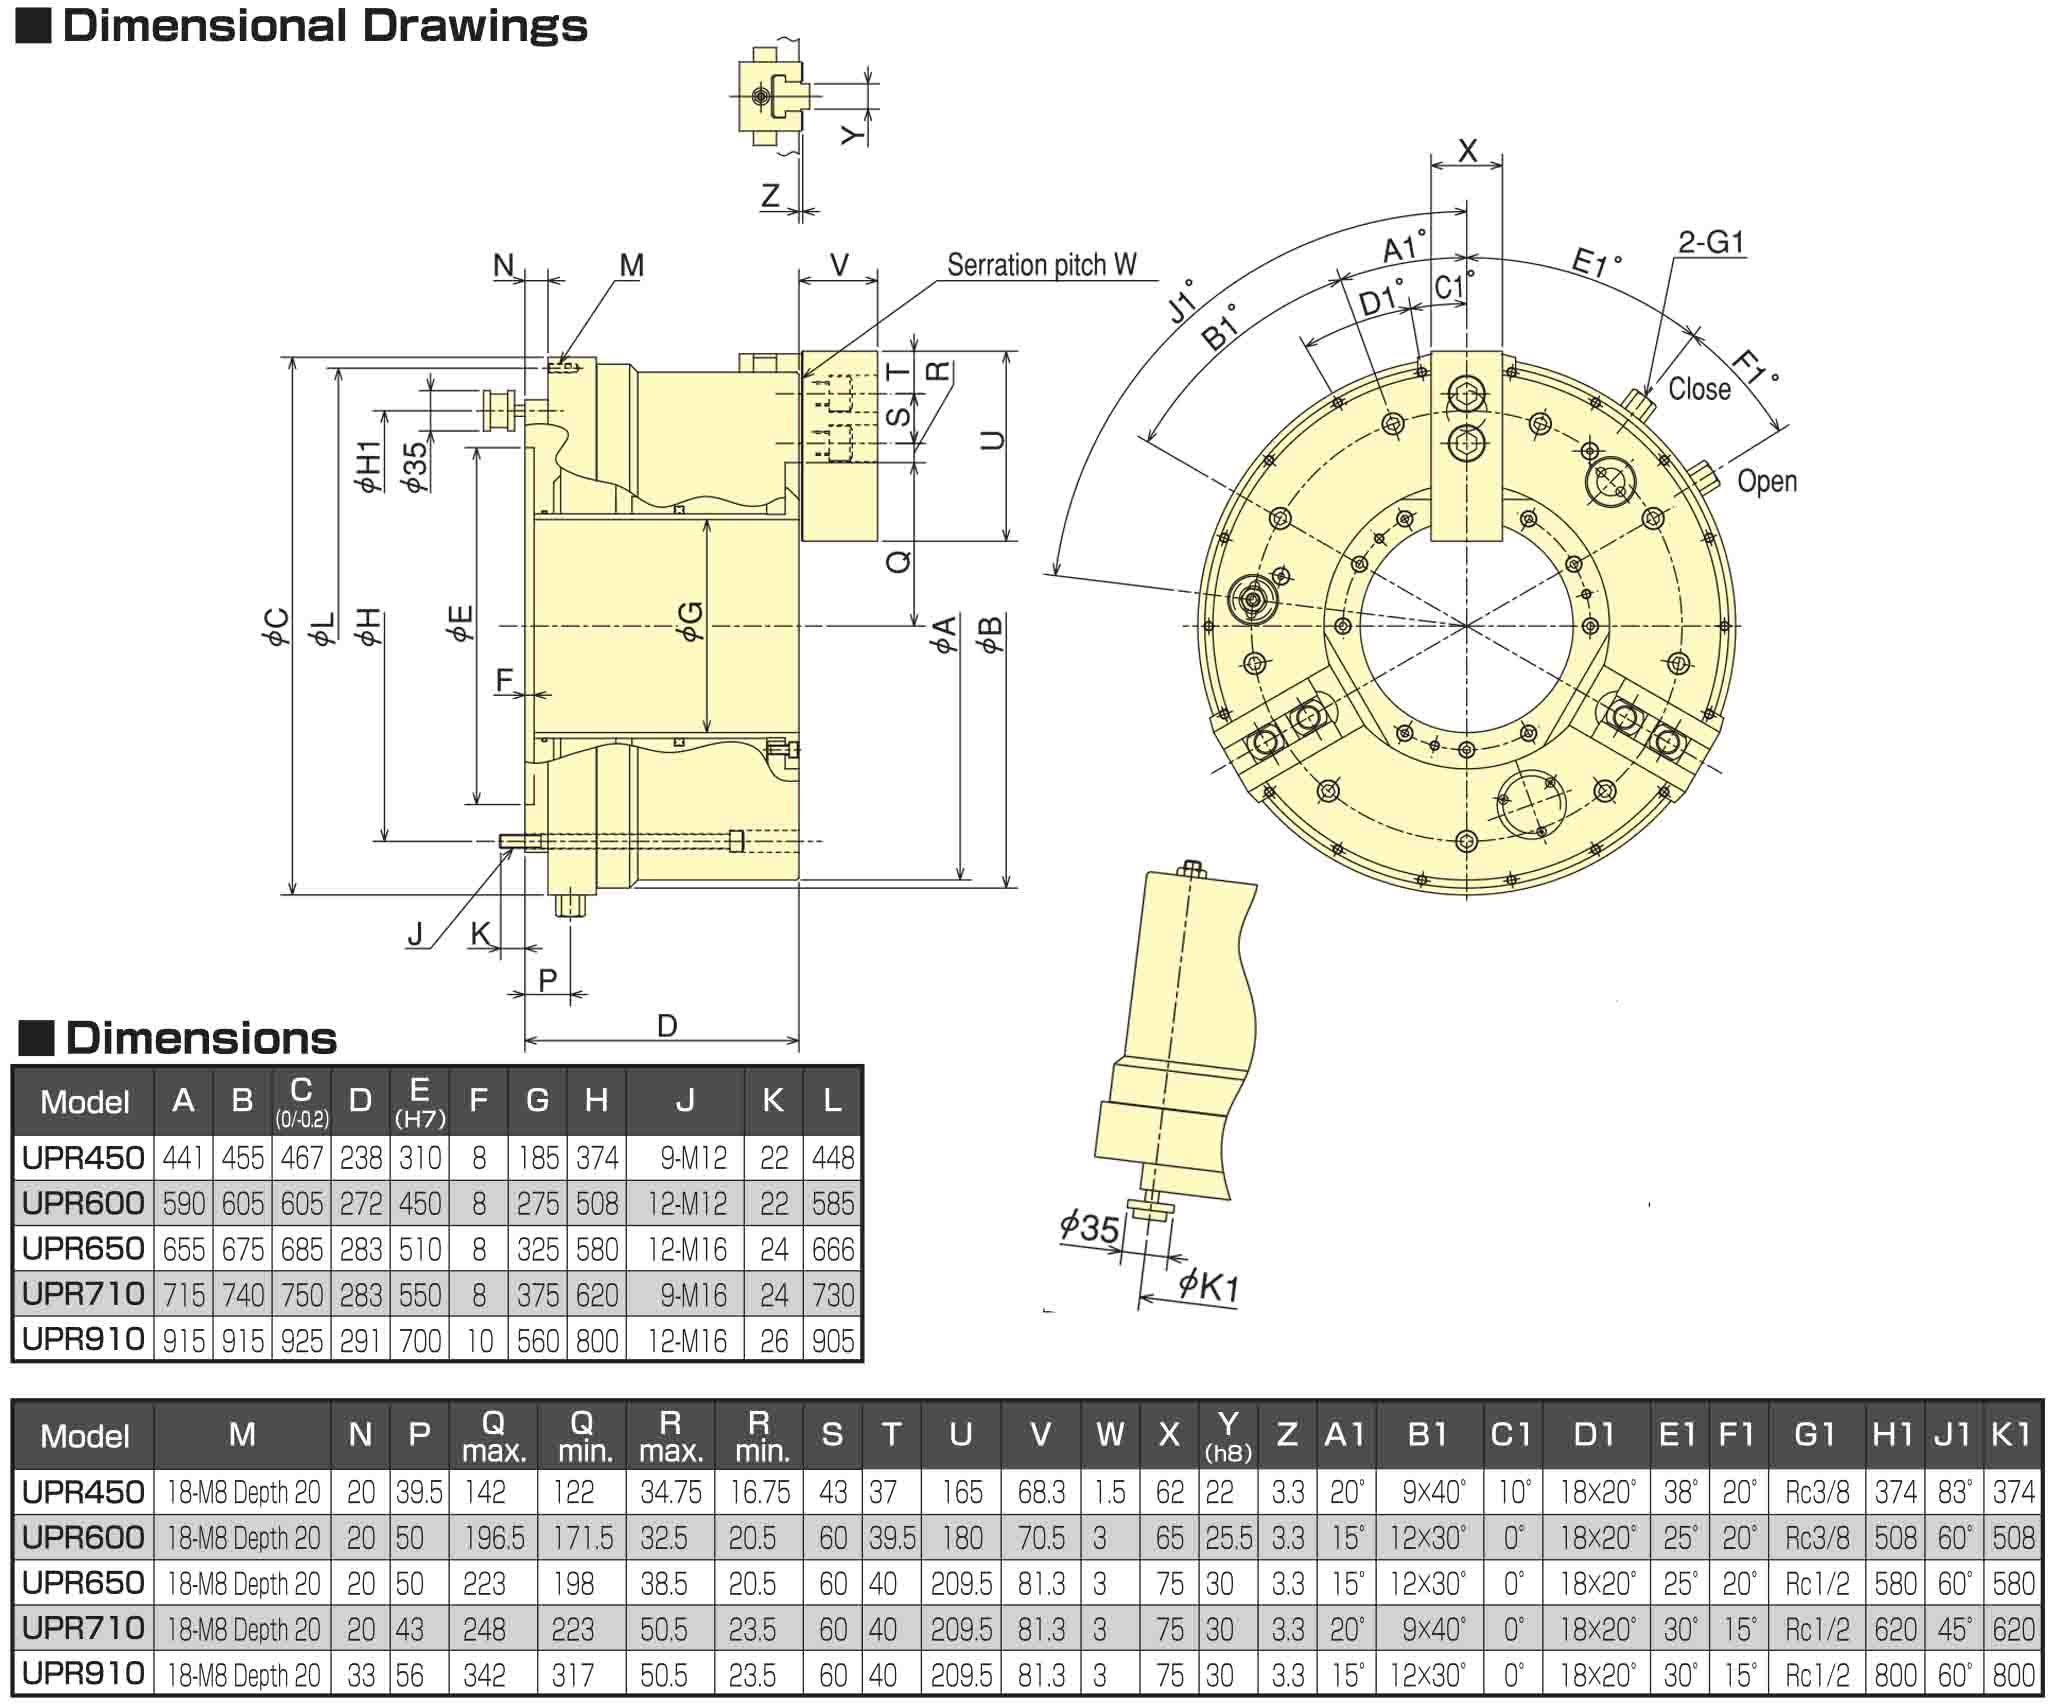 Kitagawa UPR450 Air-Operated Chuck Dimensional Drawings